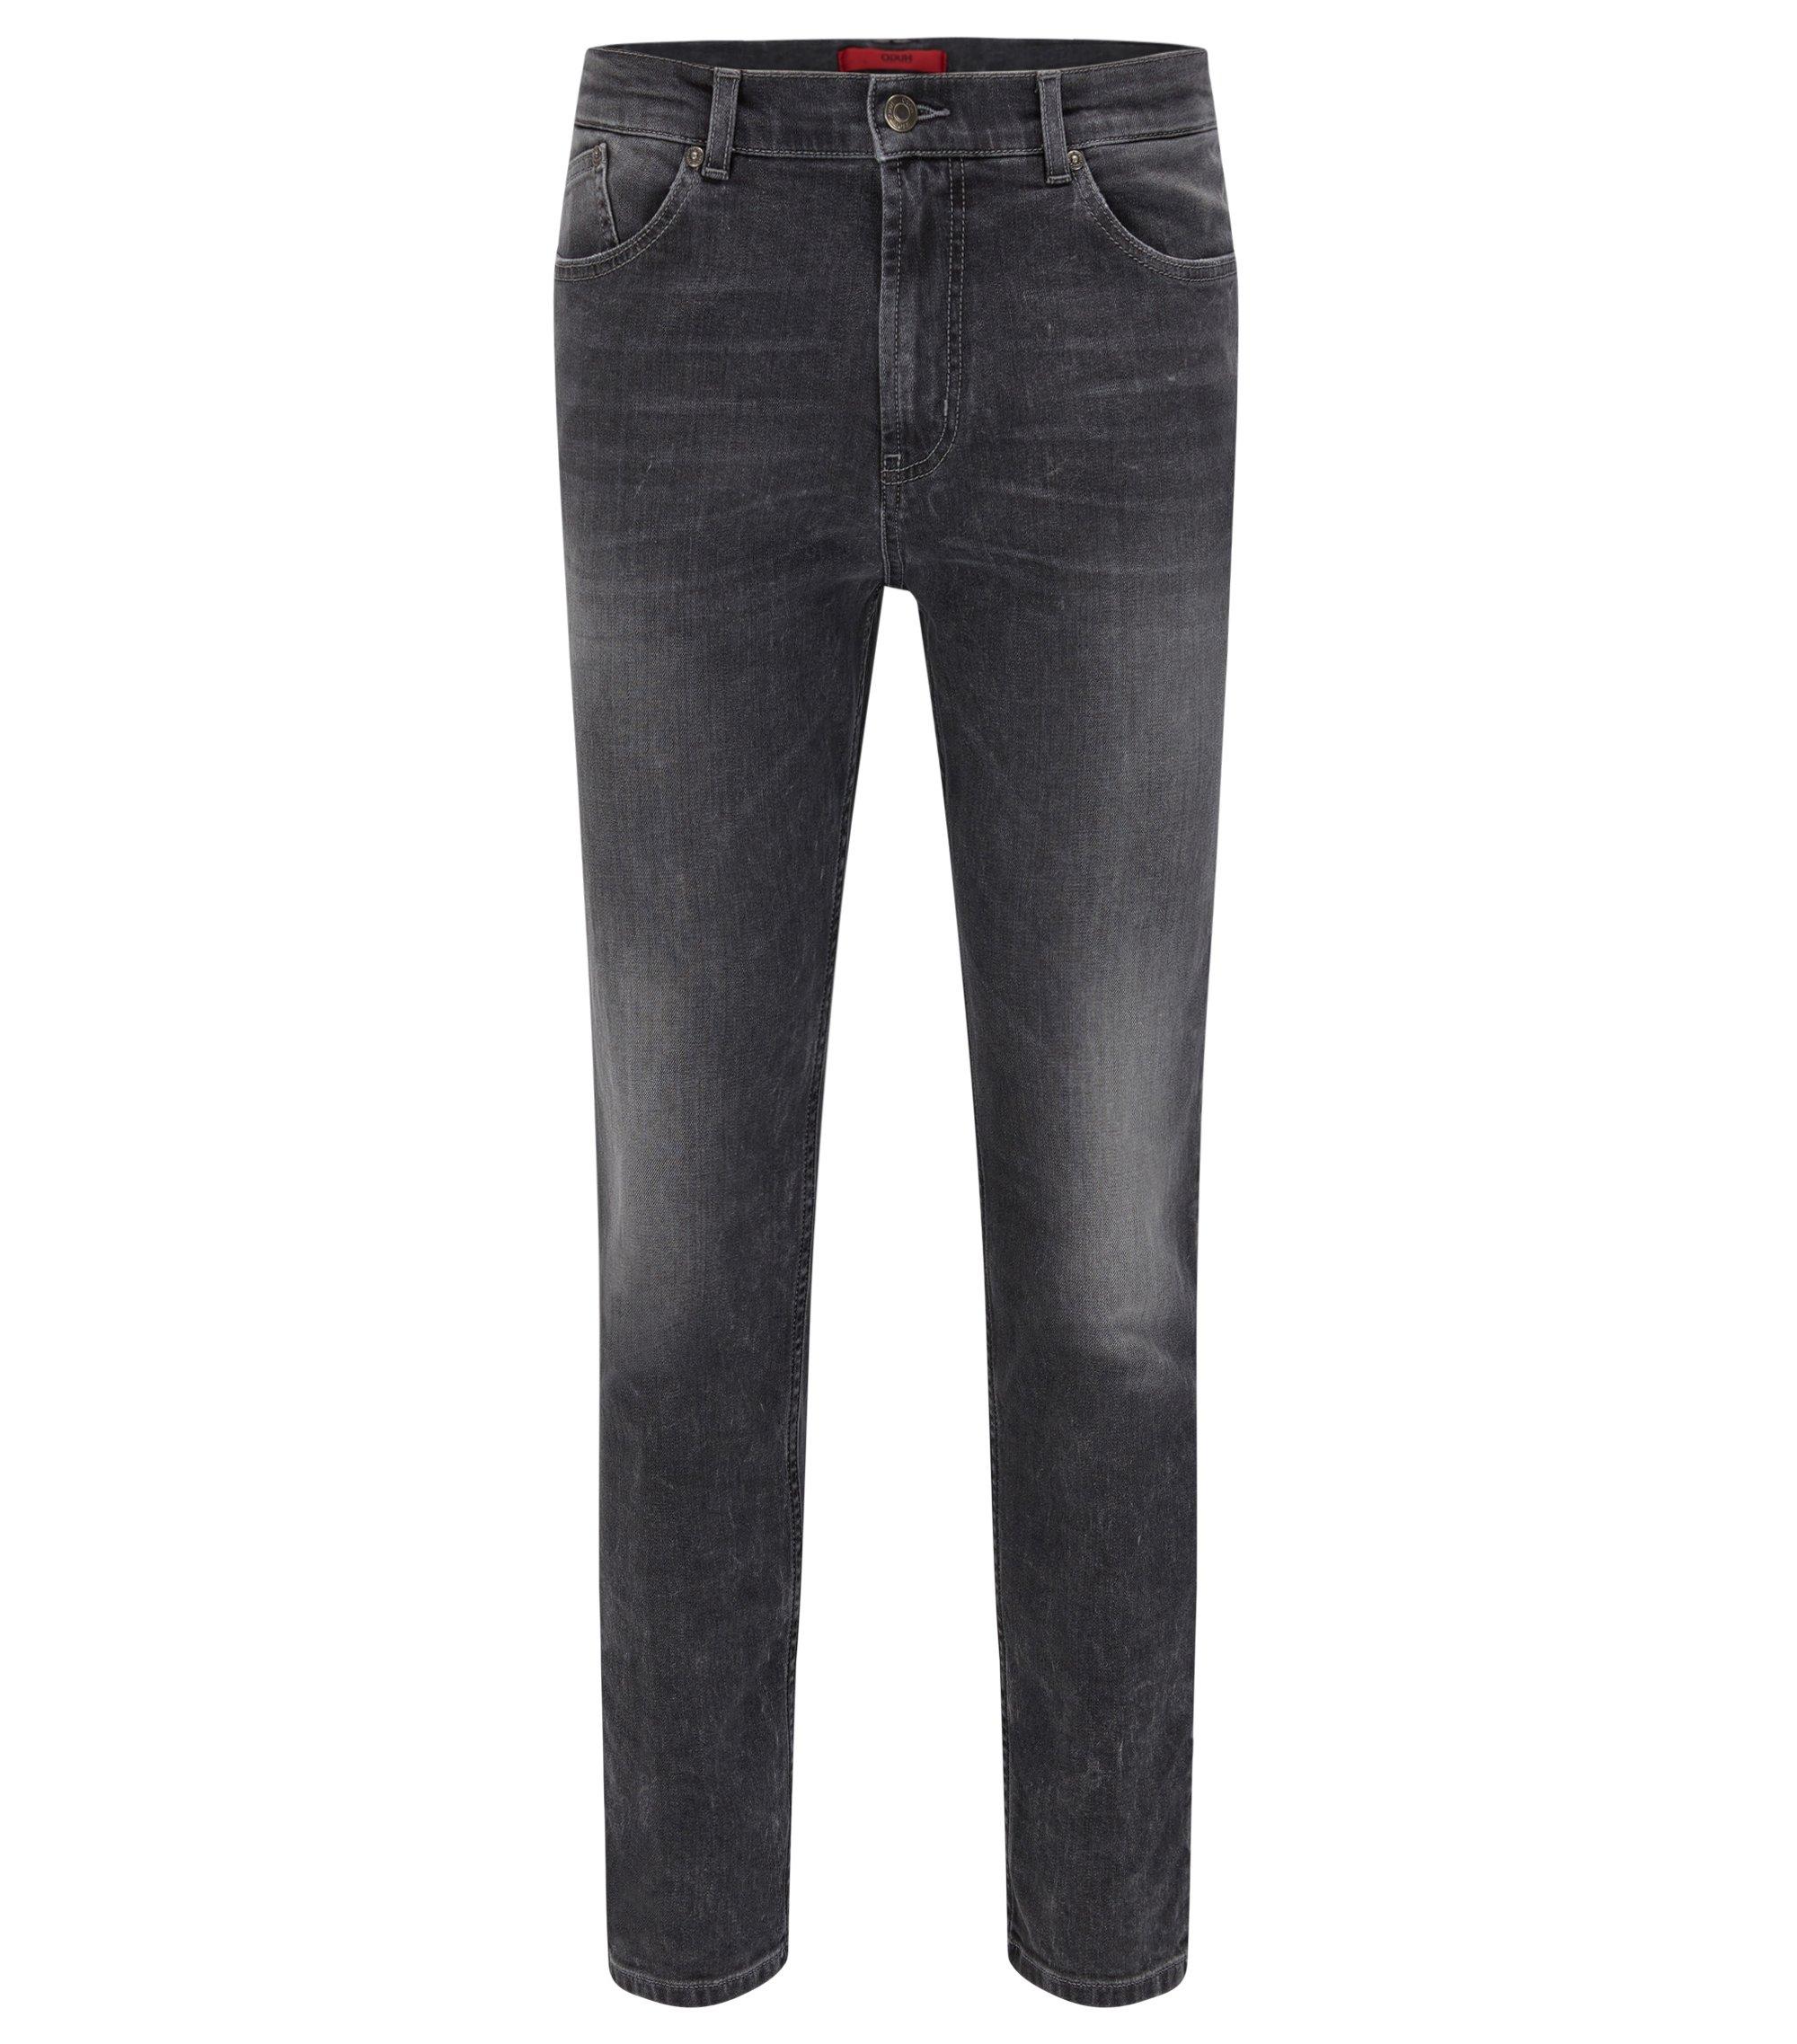 9.5 oz Stretch Cotton Jeans, Slim Fit | Hugo 332, Grey